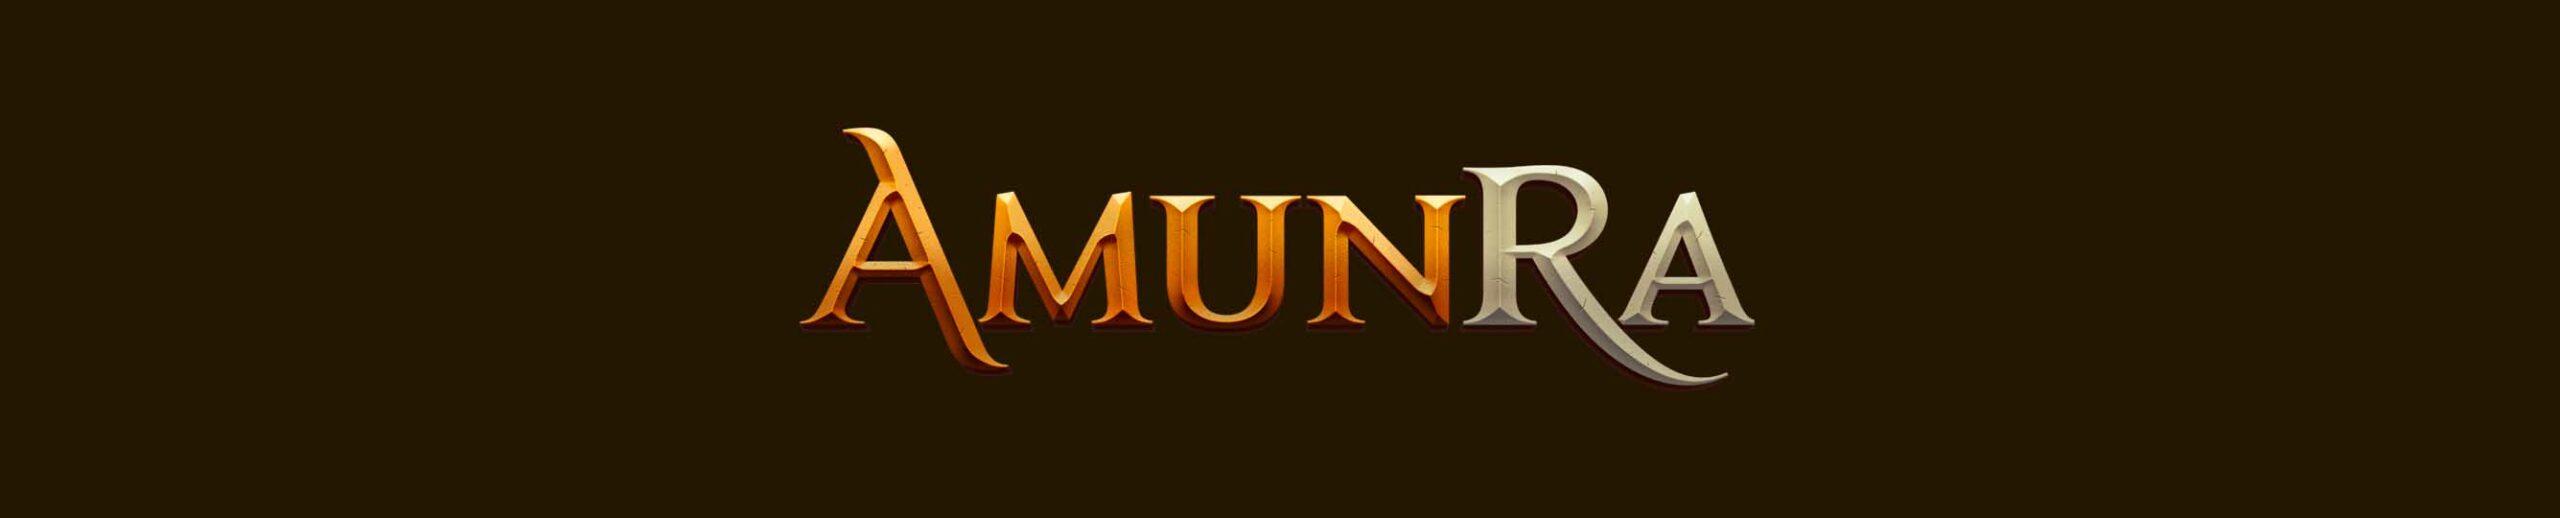 AmunRa Casino Test